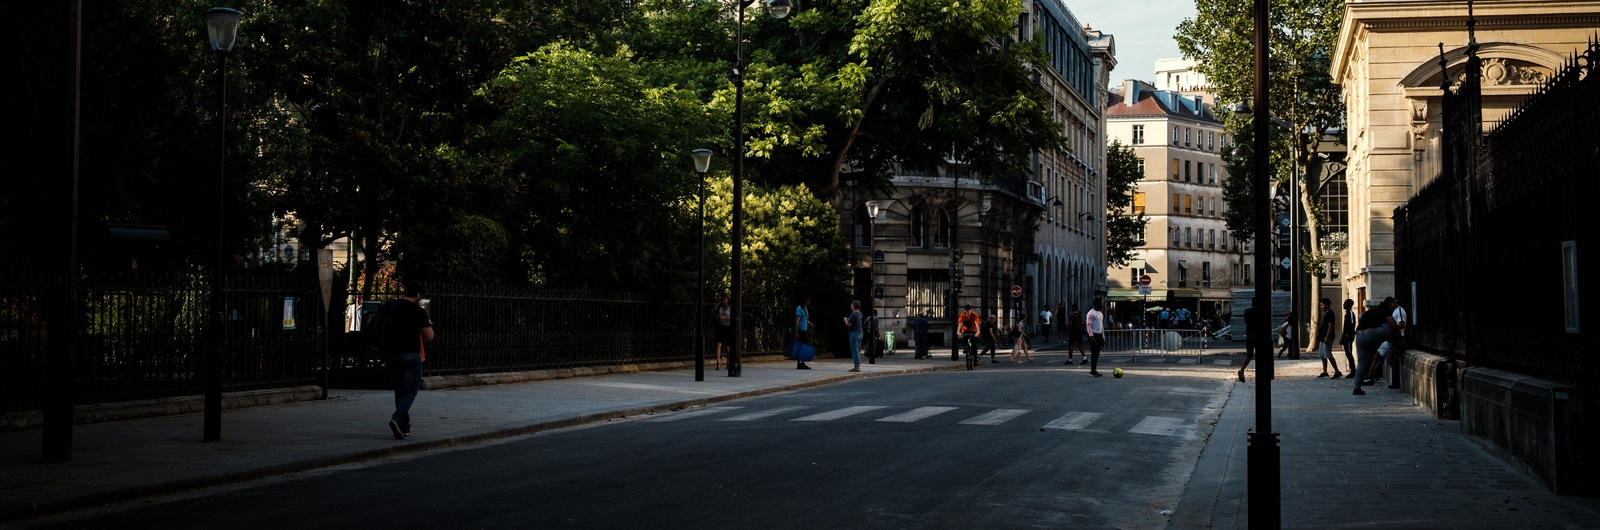 city header france street